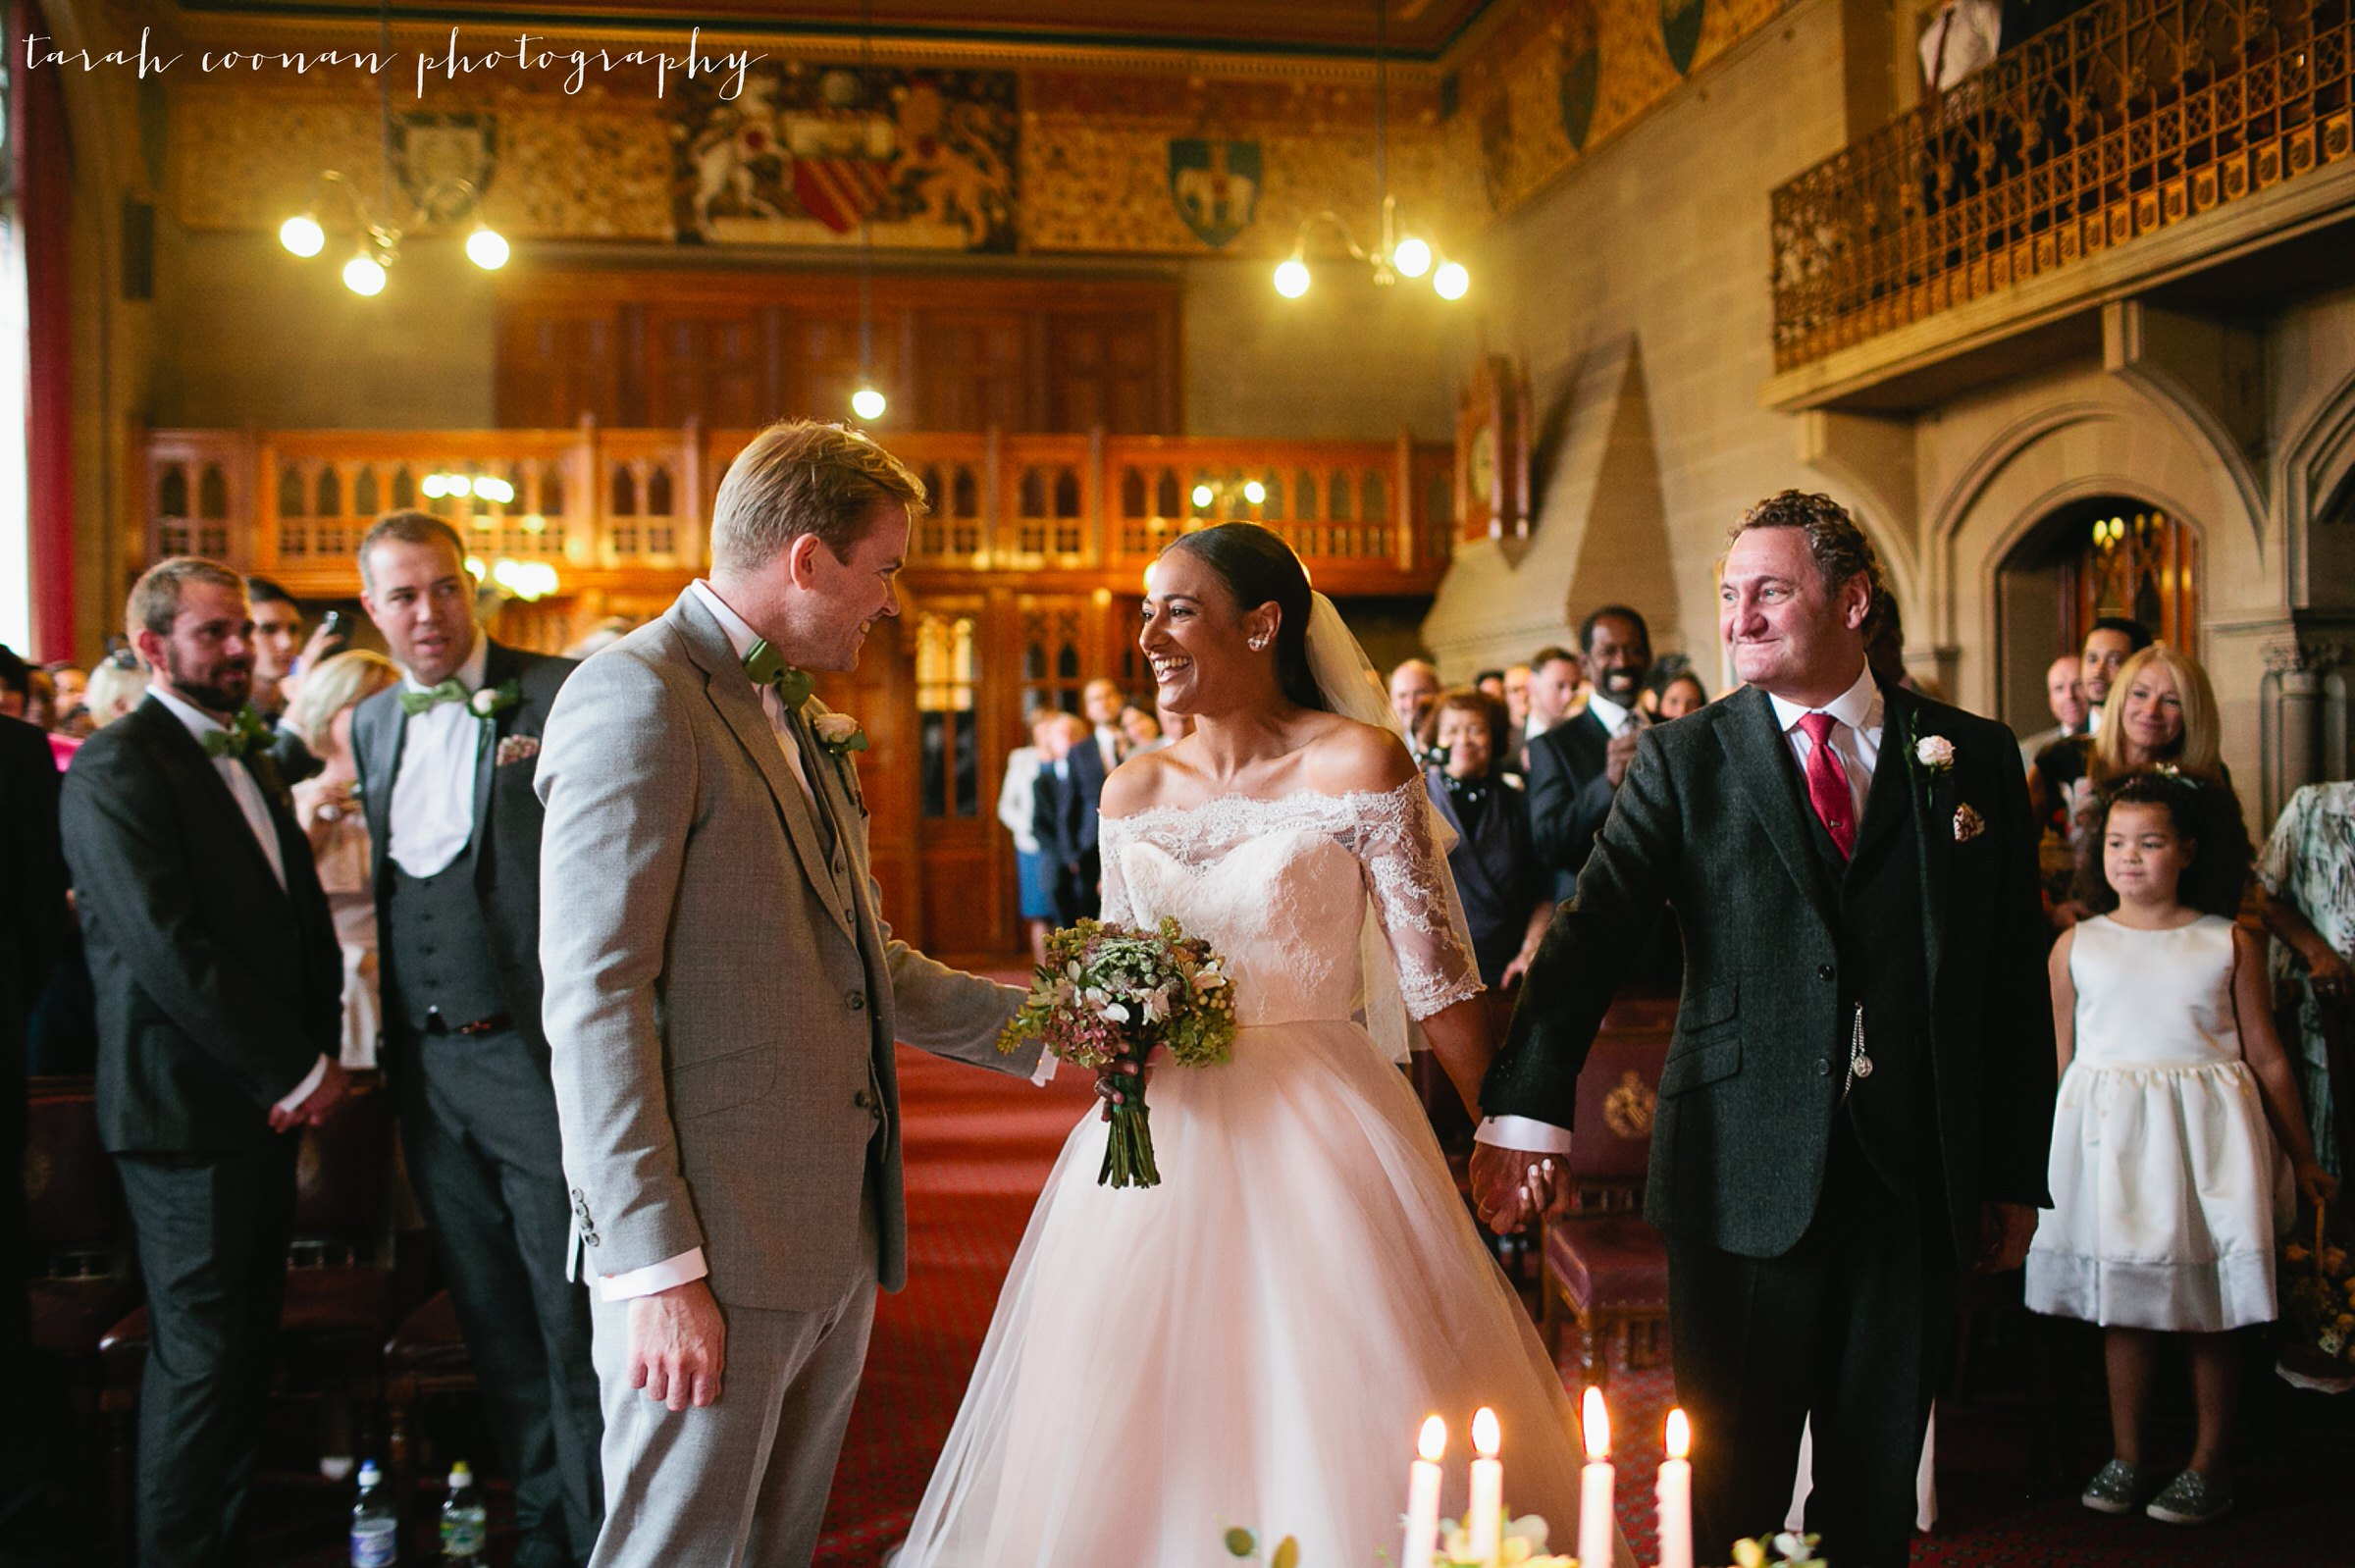 brighton-wedding-photographer11